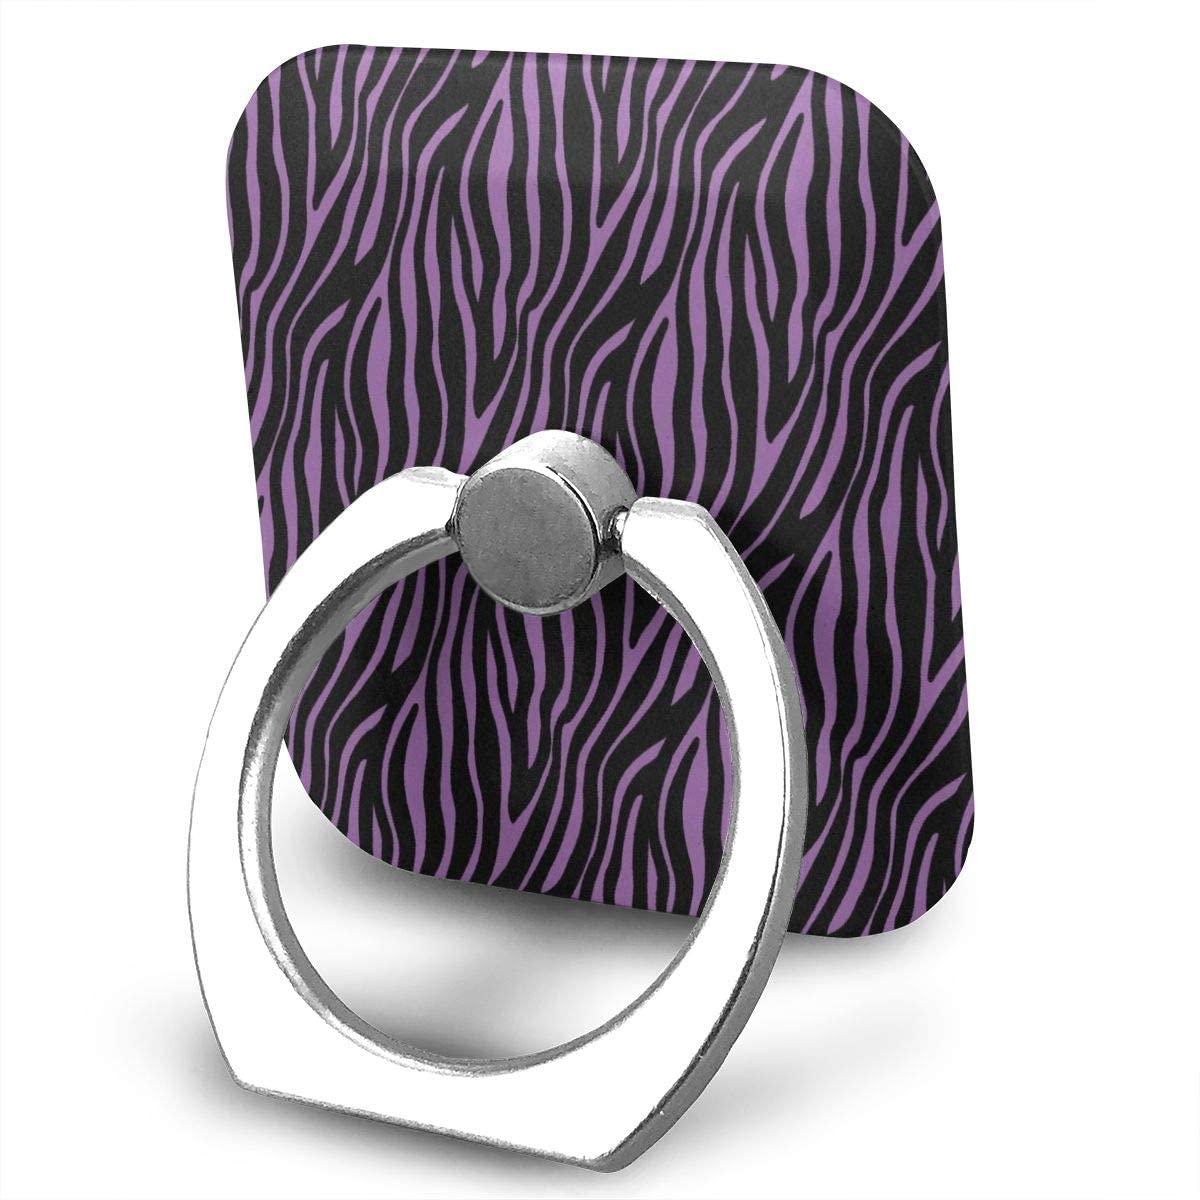 SLHFPX Cell Phone Ring Holder Stand Zebra Fur Skin Print Adjustable 360°Rotation Square Universal Finger Grip Loop Kickstand with Silver Metal Phone Holder for Women Kids Men Ladies Smartphones